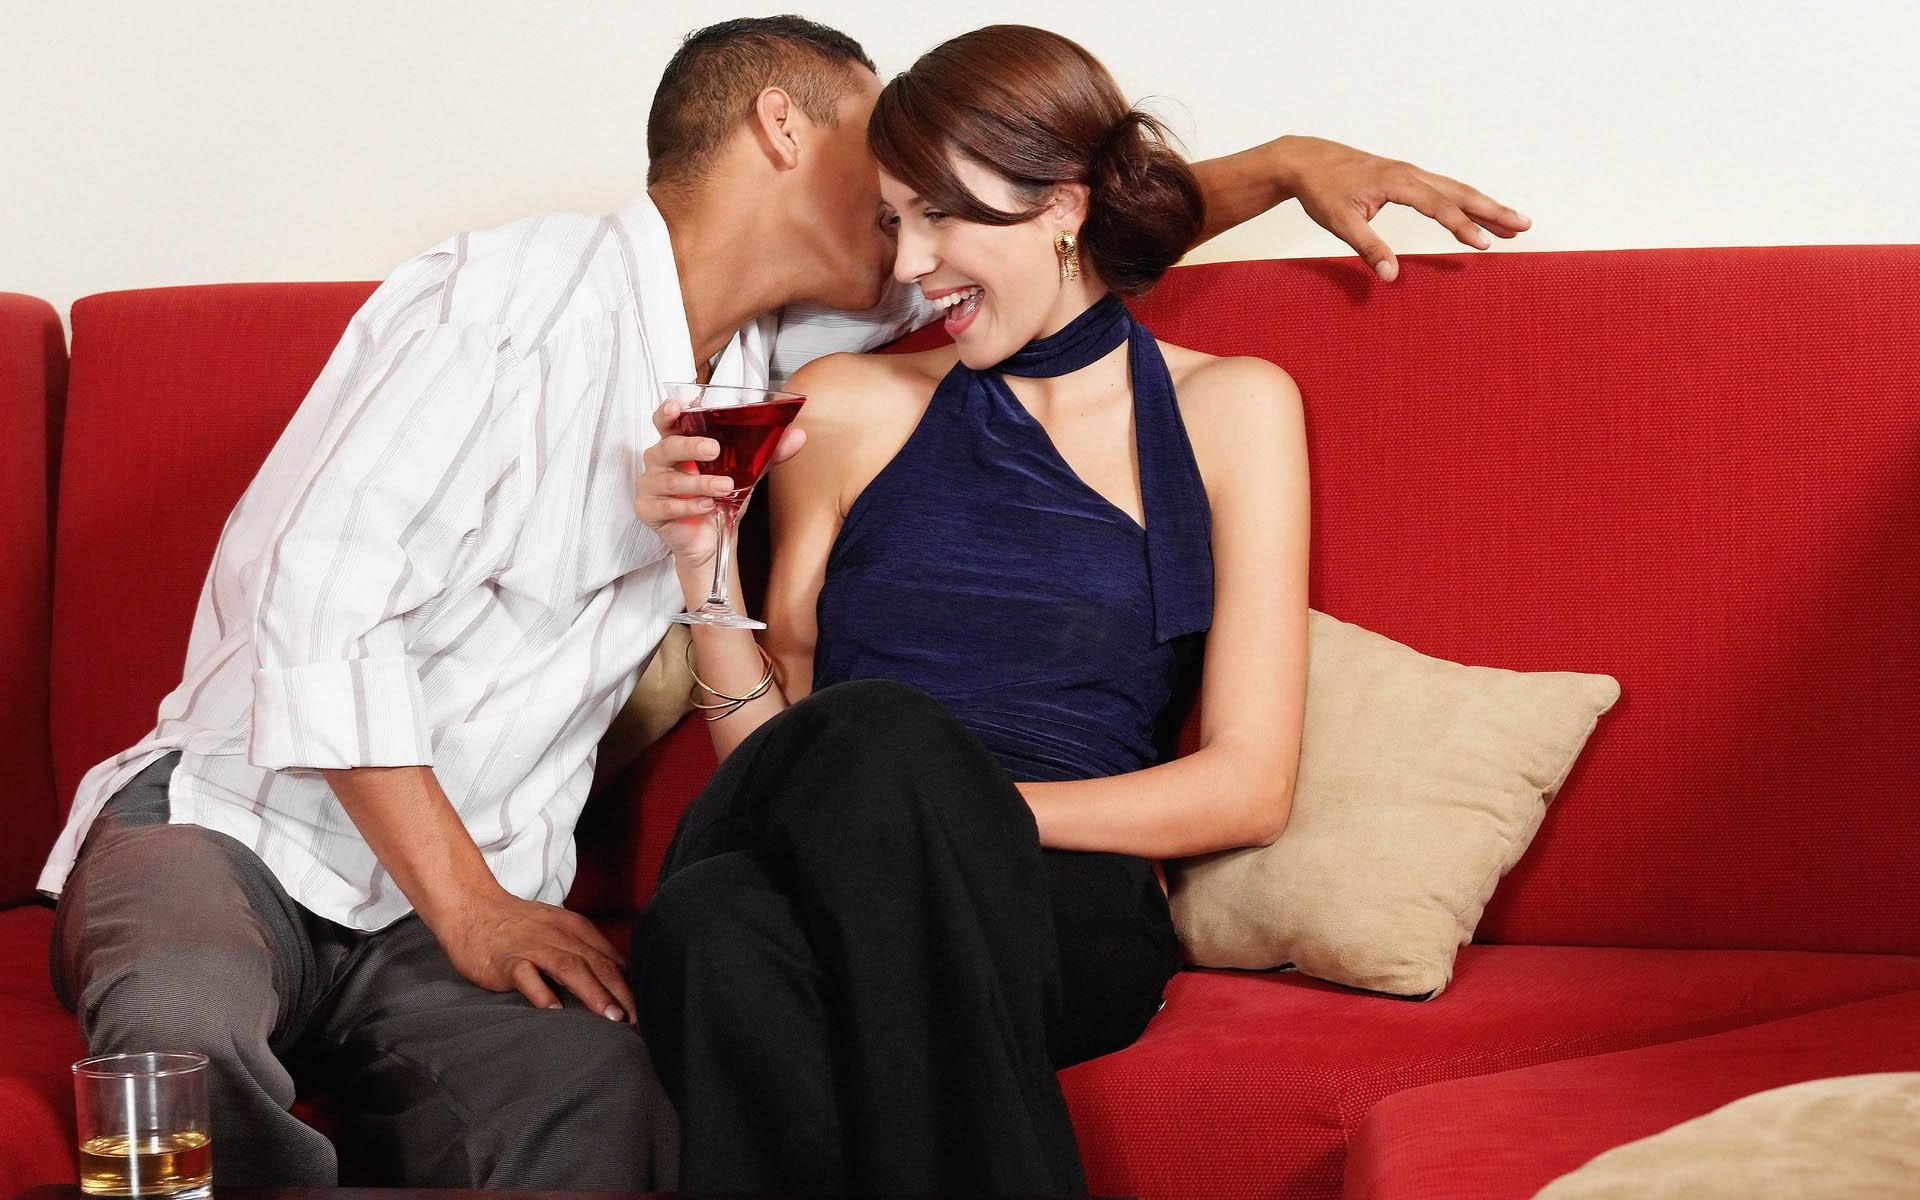 The fearful and wonderful art of flirting